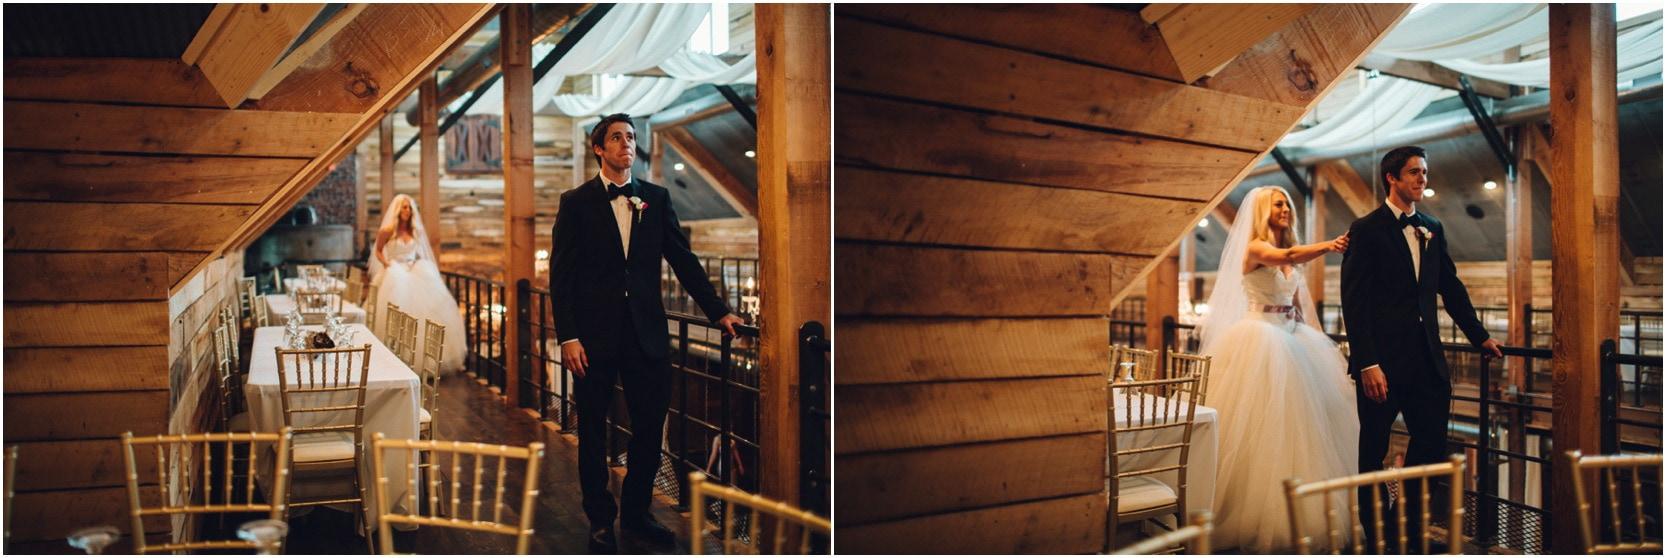 coderhillengburg_oklahoma_wedding__382_blogstomped